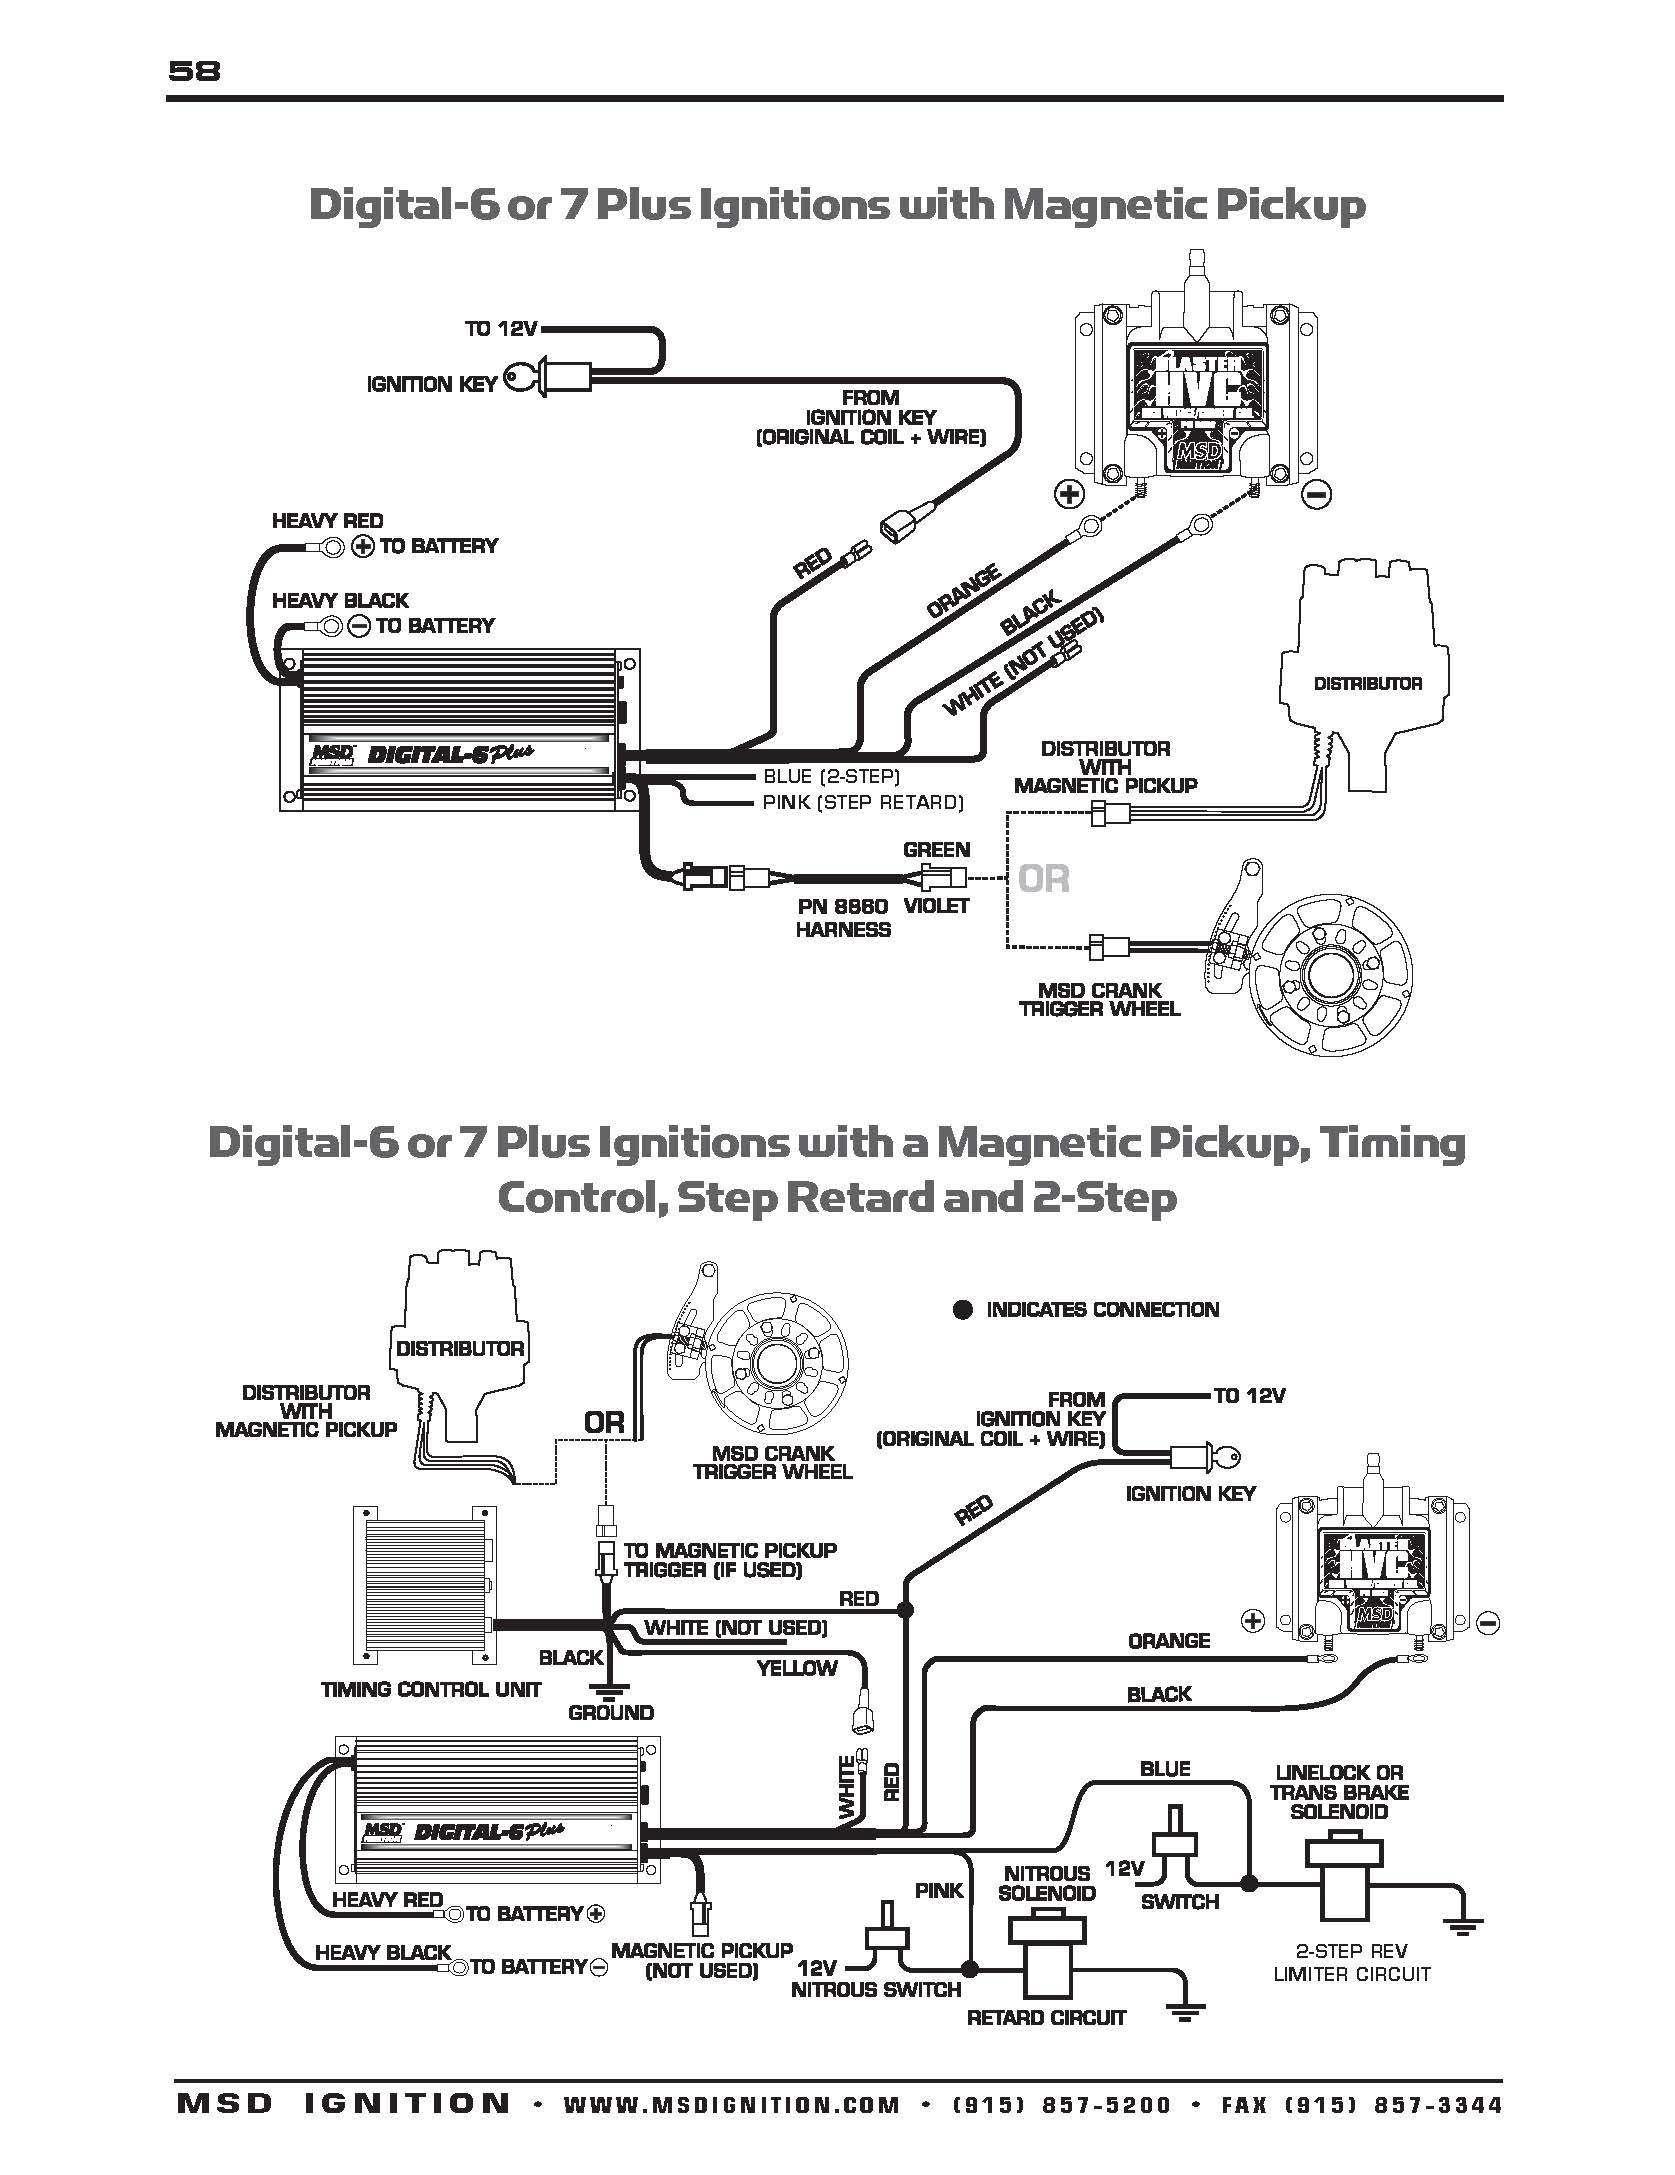 Wiring Diagram For Msd 2 Step | Wiring Library - Msd Digital 6 Plus Wiring Diagram